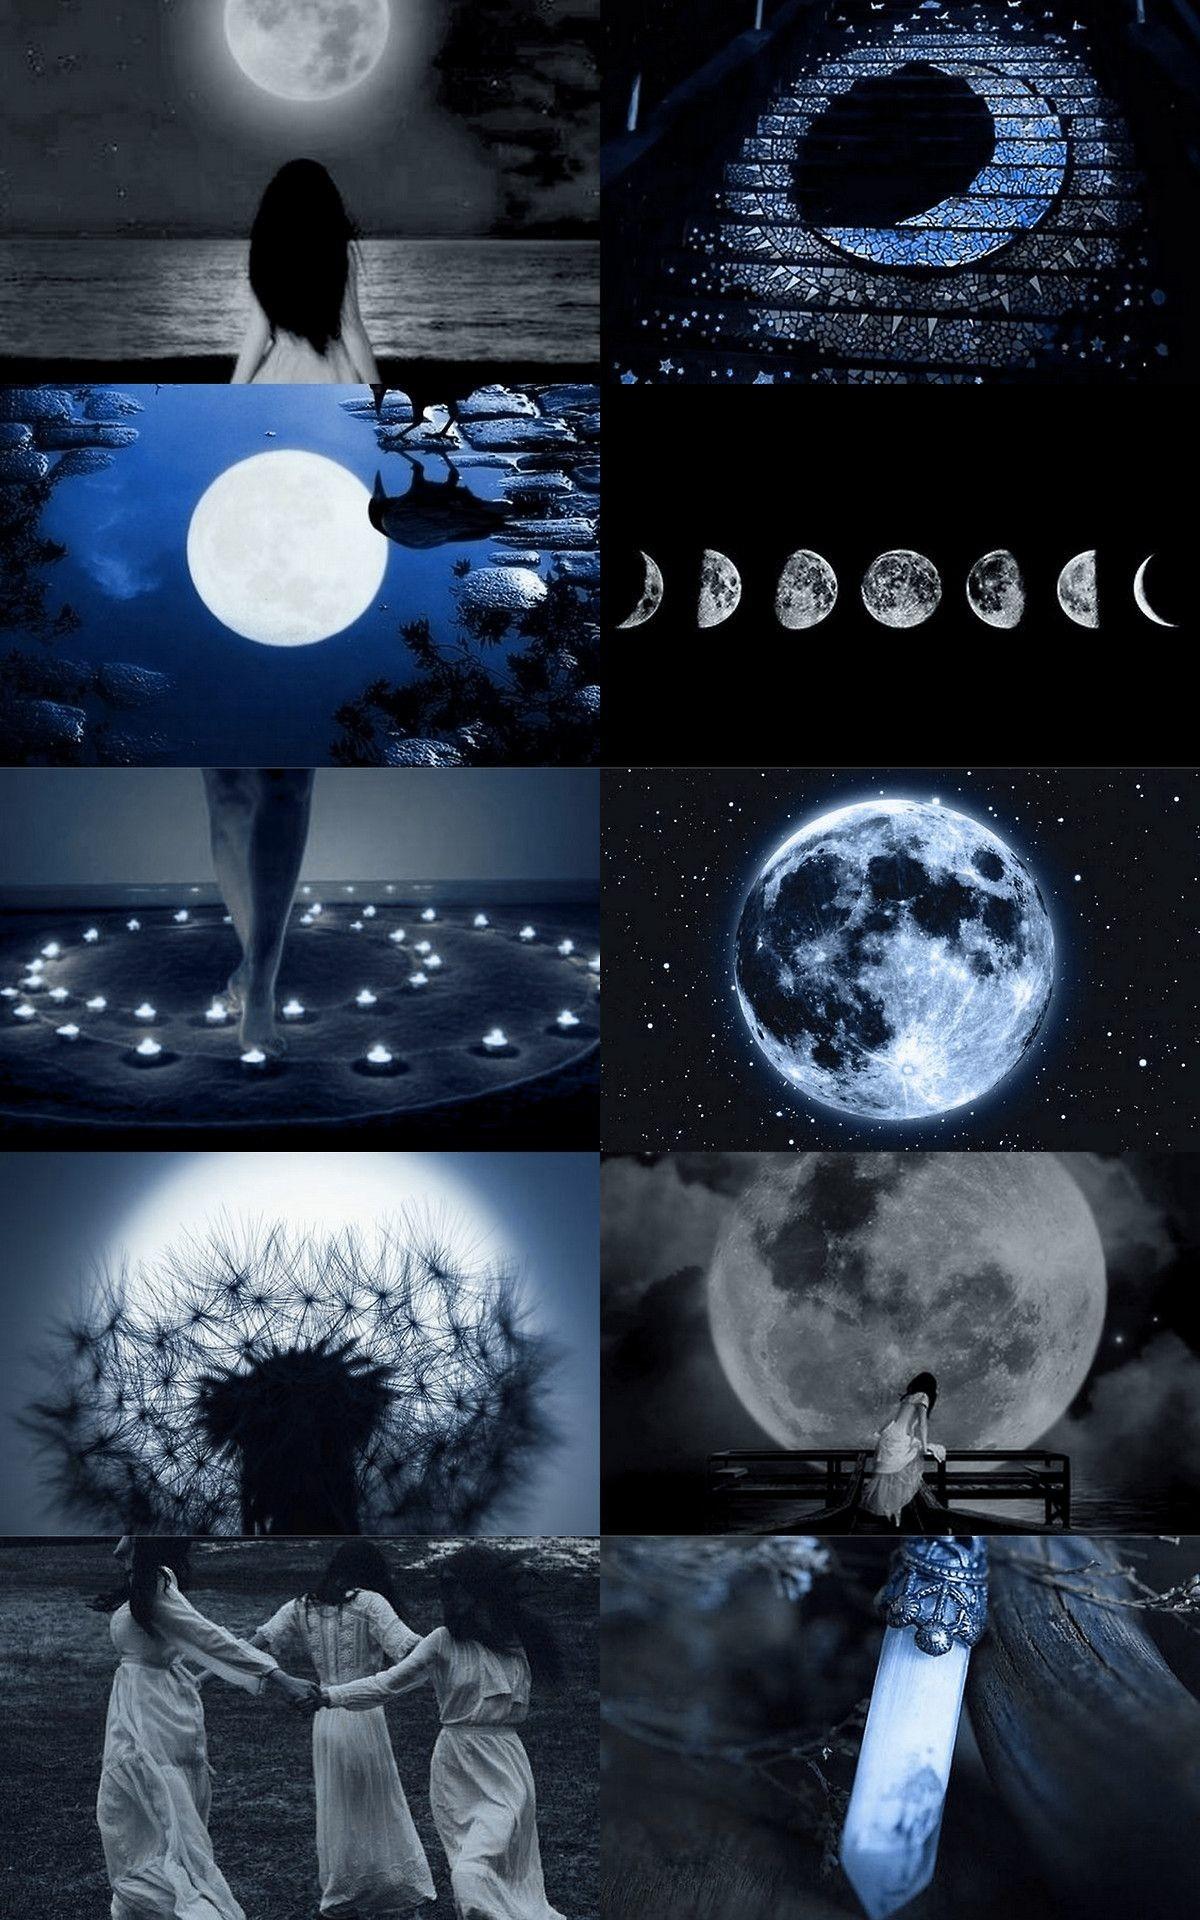 Moon Goddess Wallpaper 59 Images